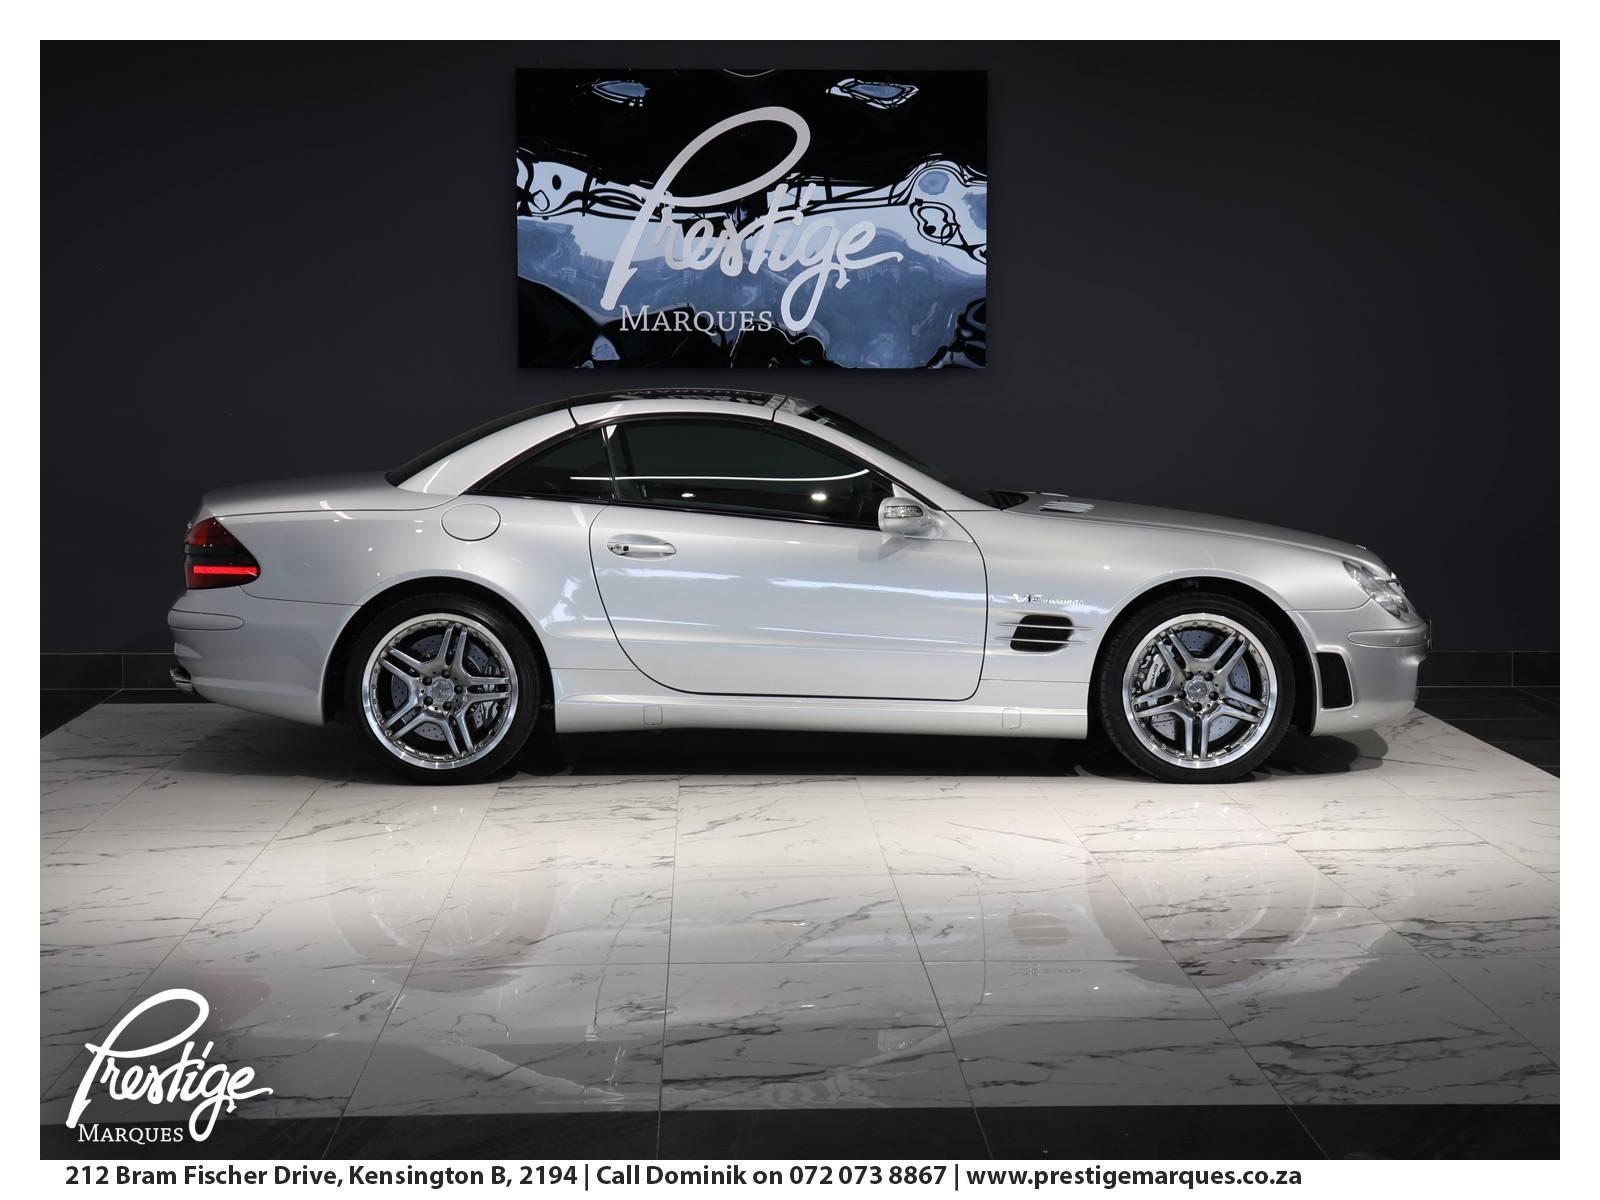 2006-Mercedes-Benz-SL65-AMG-Prestige-Marques-Randburg-Sandton-4